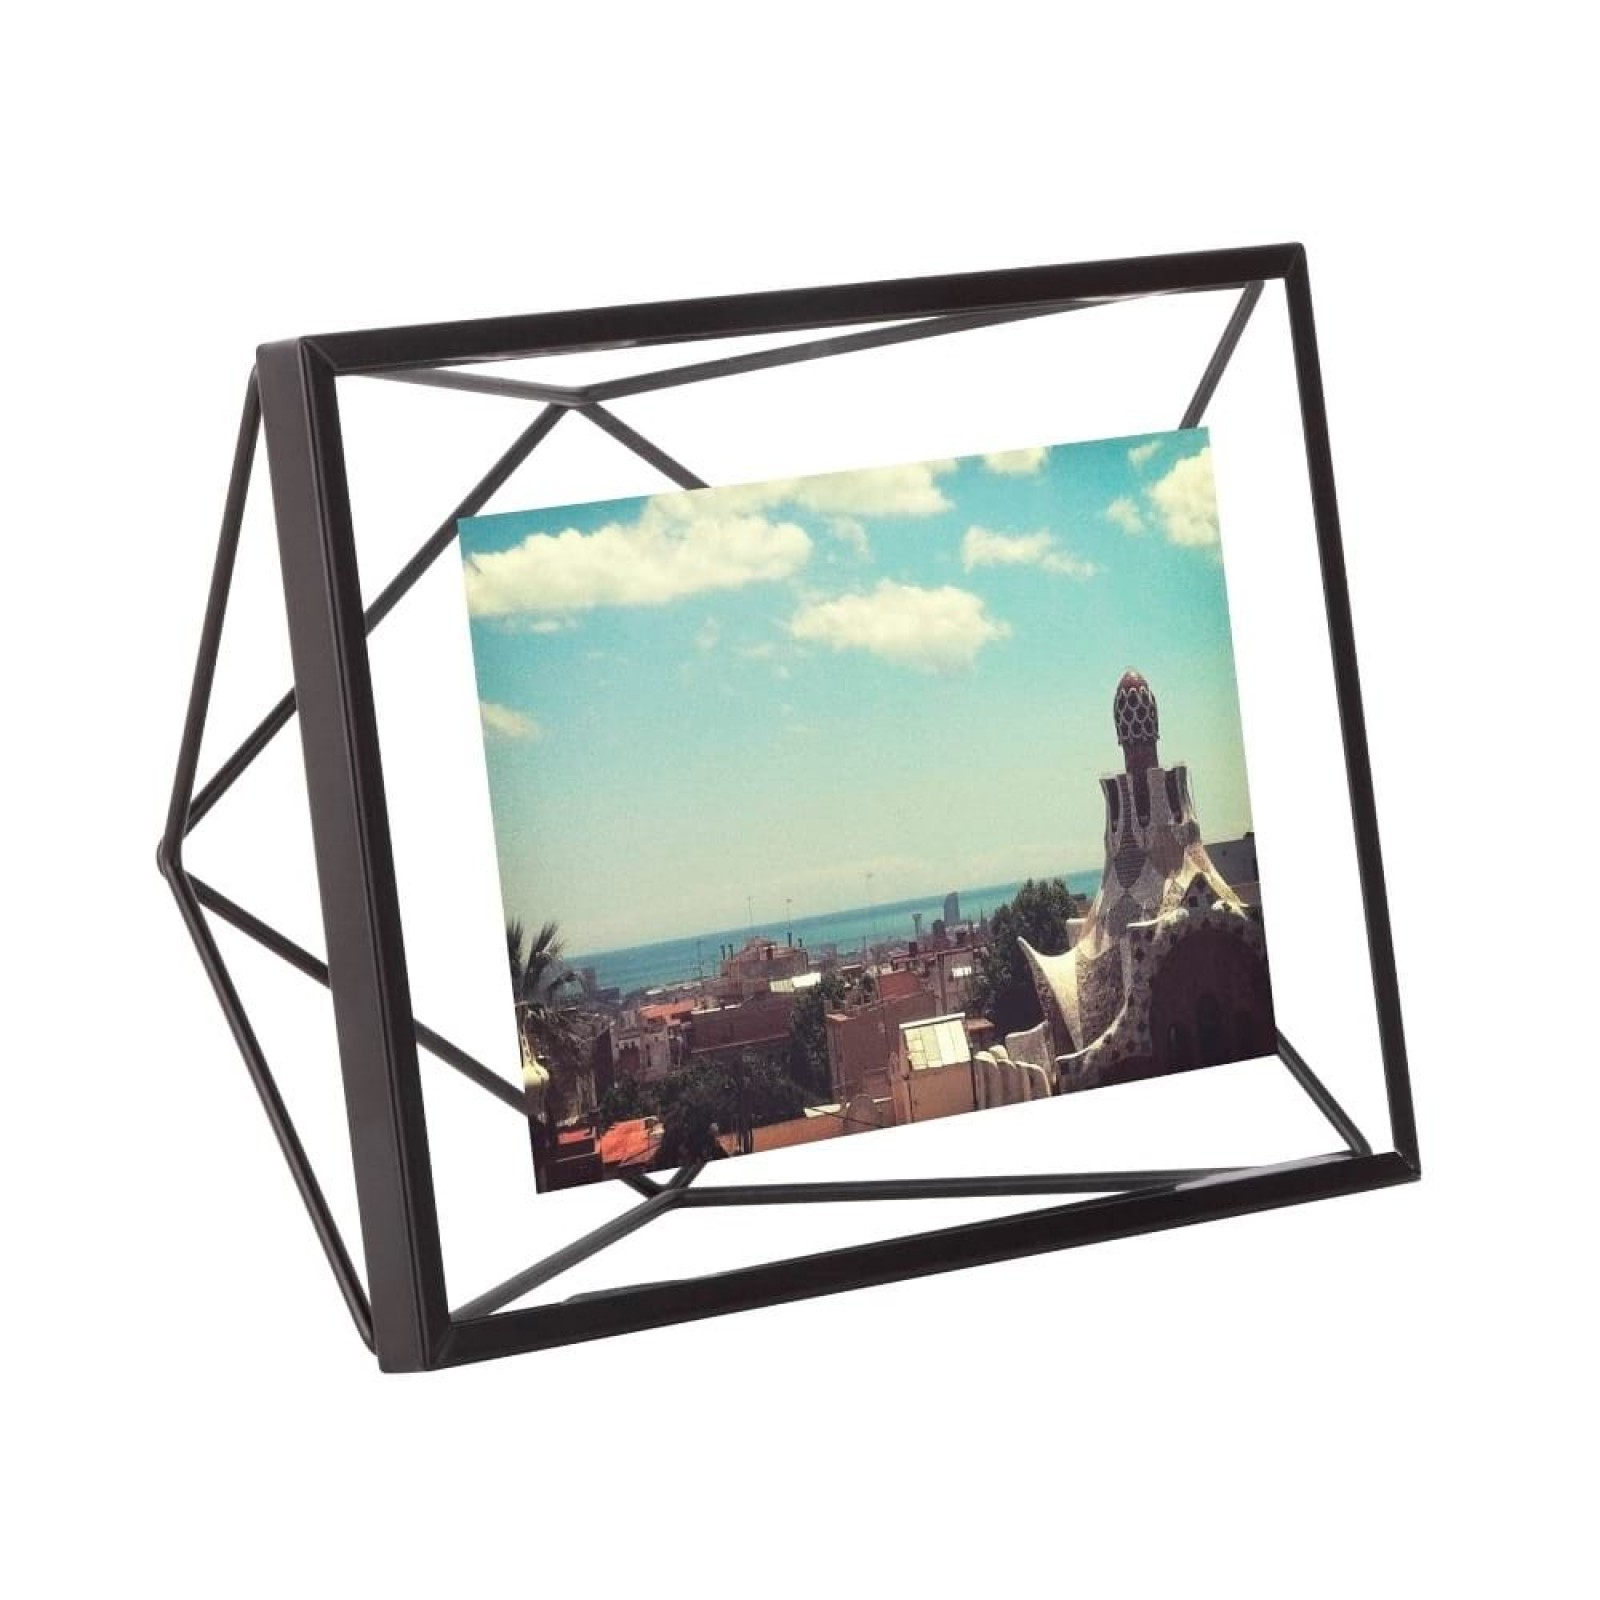 Prisma Photo Display 10 x 15 cm (Black) - Umbra